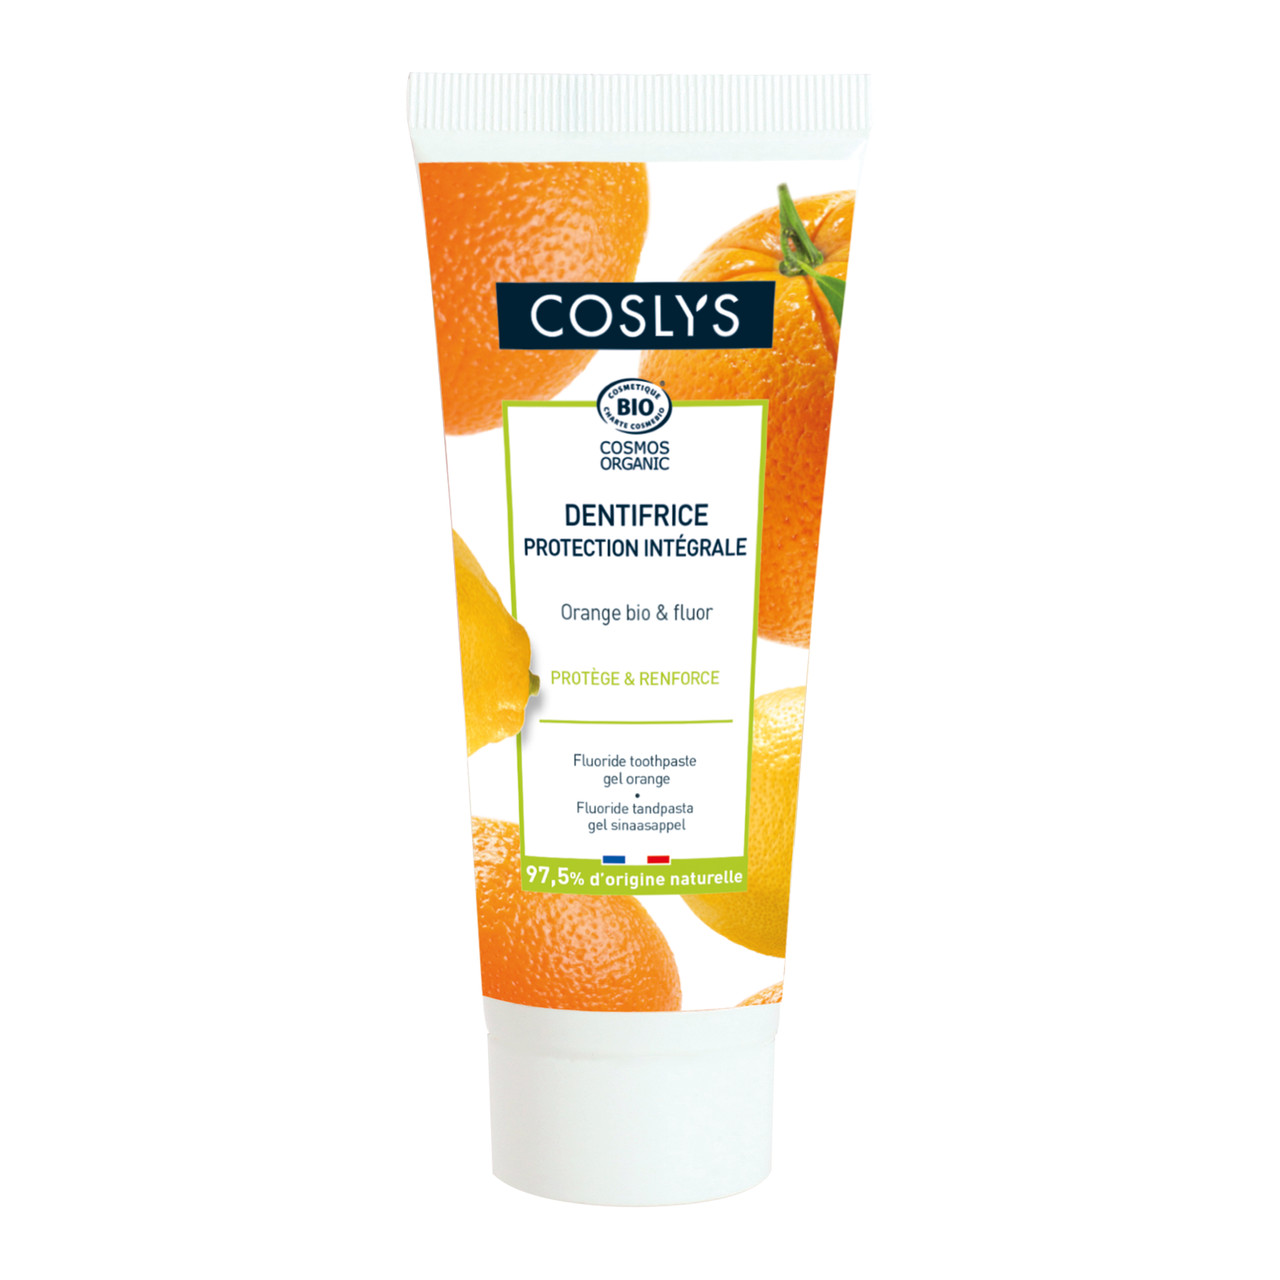 Гелевая зубная паста с ароматом апельсина Coslys,75 мл